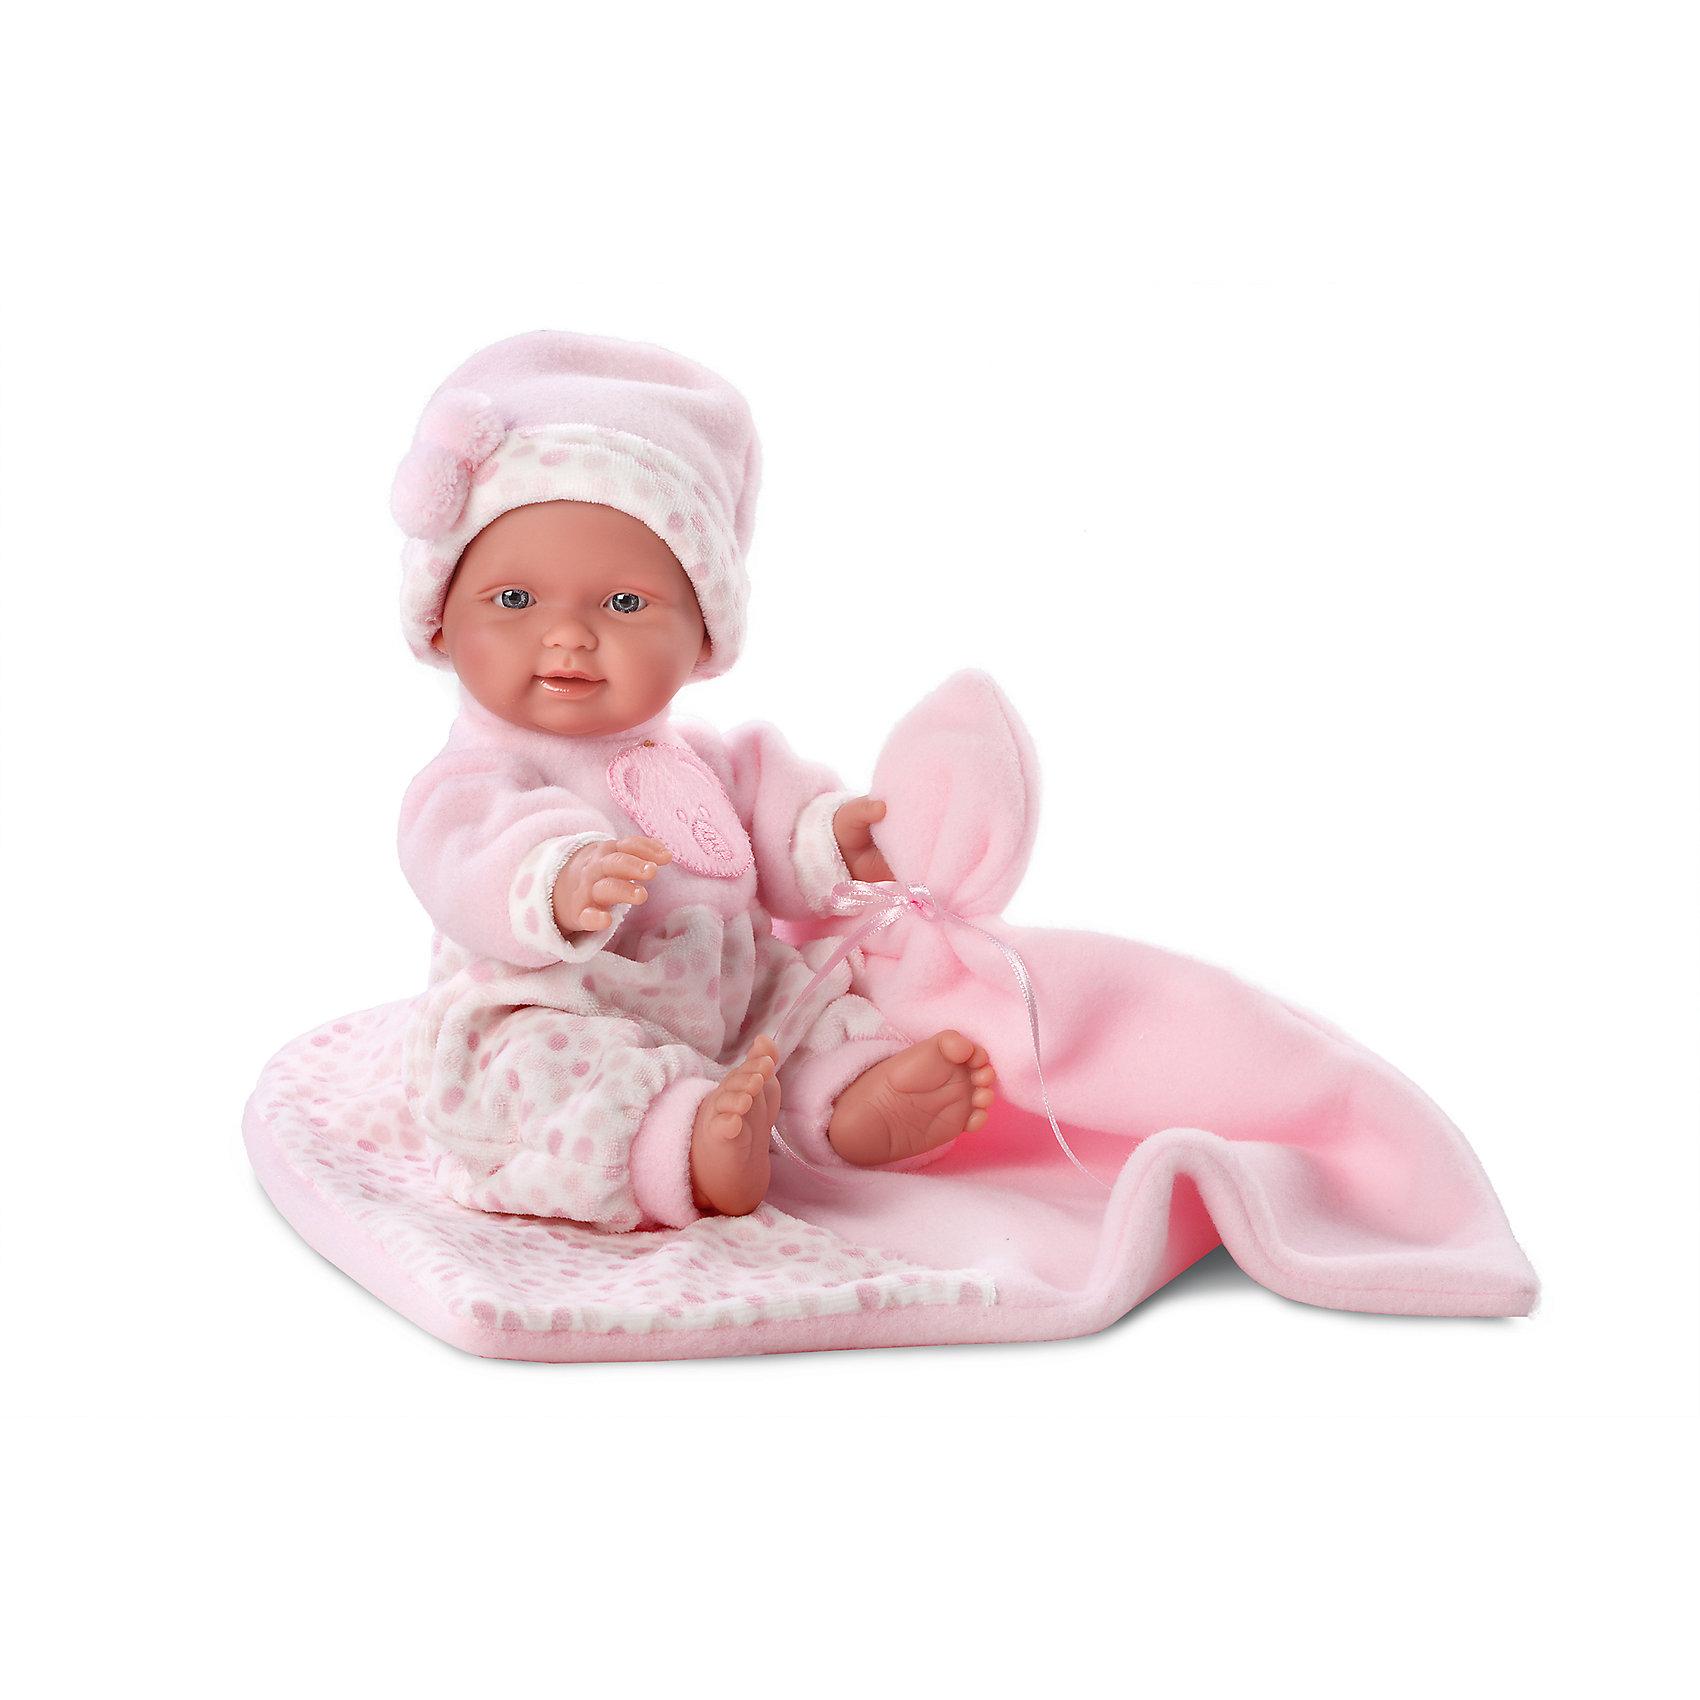 Llorens Кукла  БэбитаРоза с одеялом, 26 см, Llorens куклы и одежда для кукол llorens кукла изабела 33 см со звуком